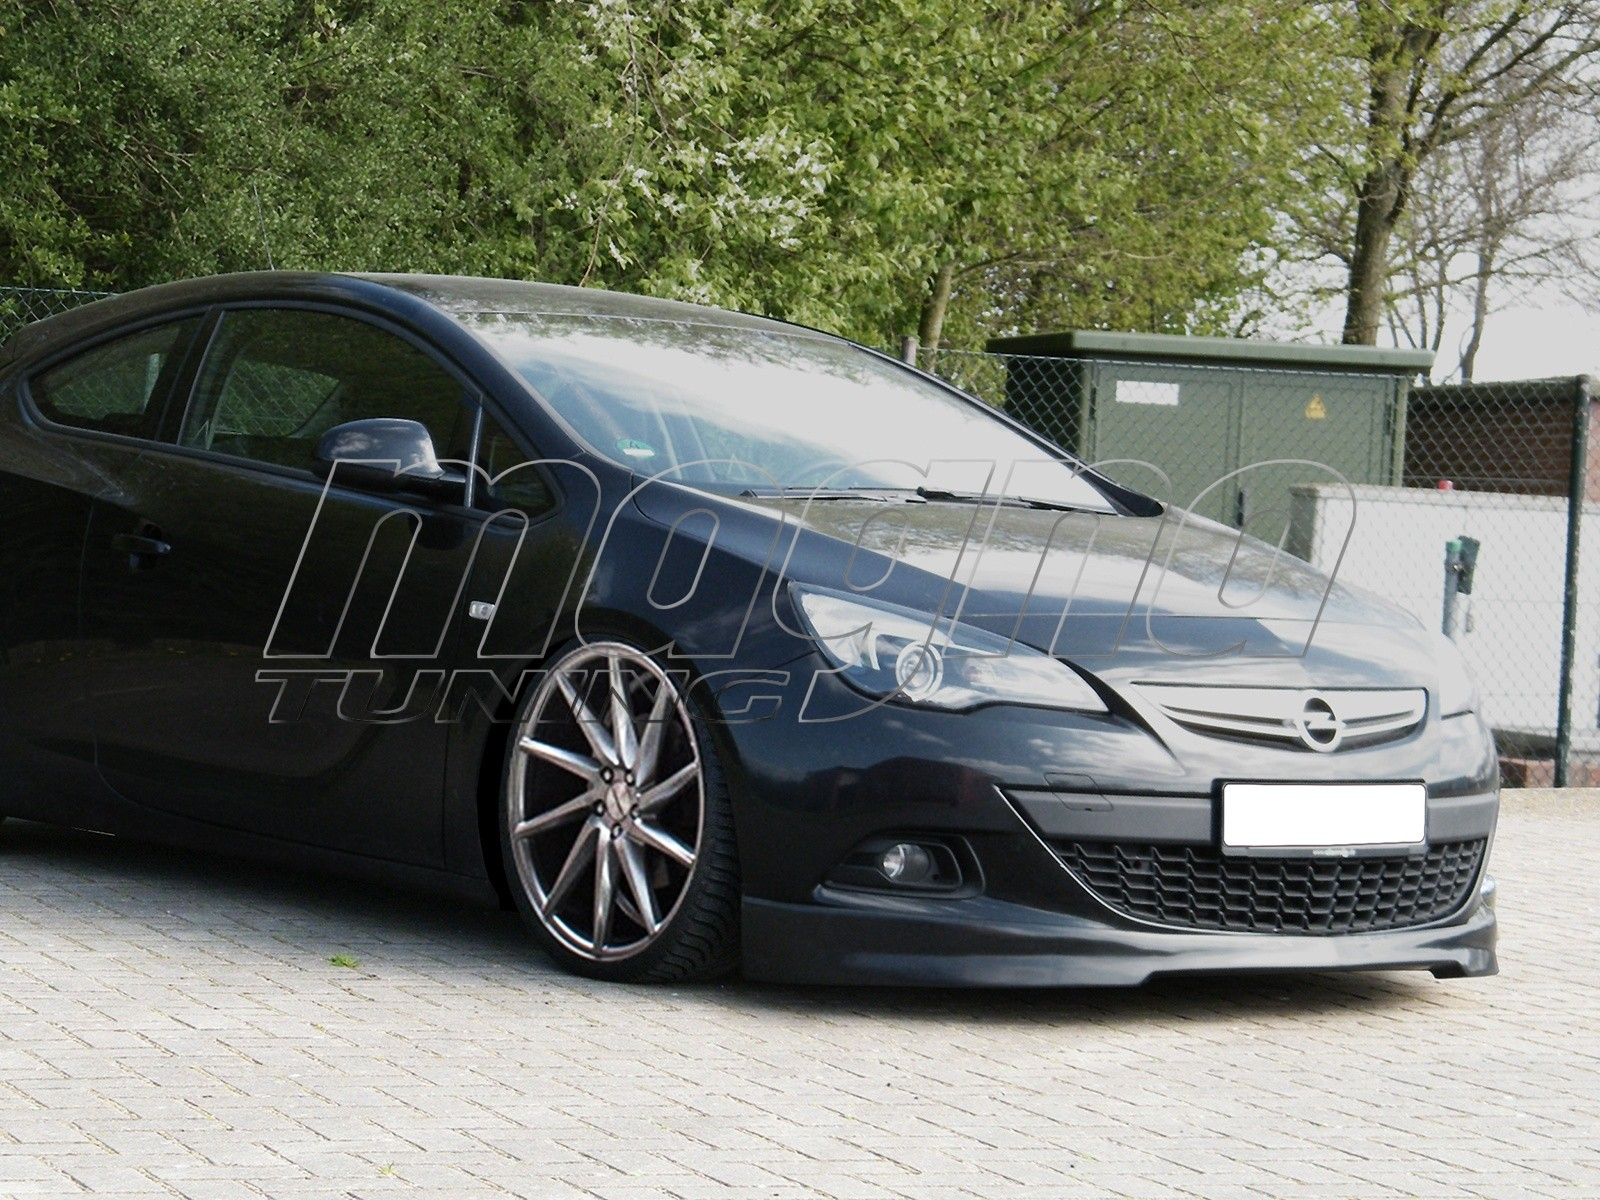 Opel Astra J GTC Iris Front Bumper Extension